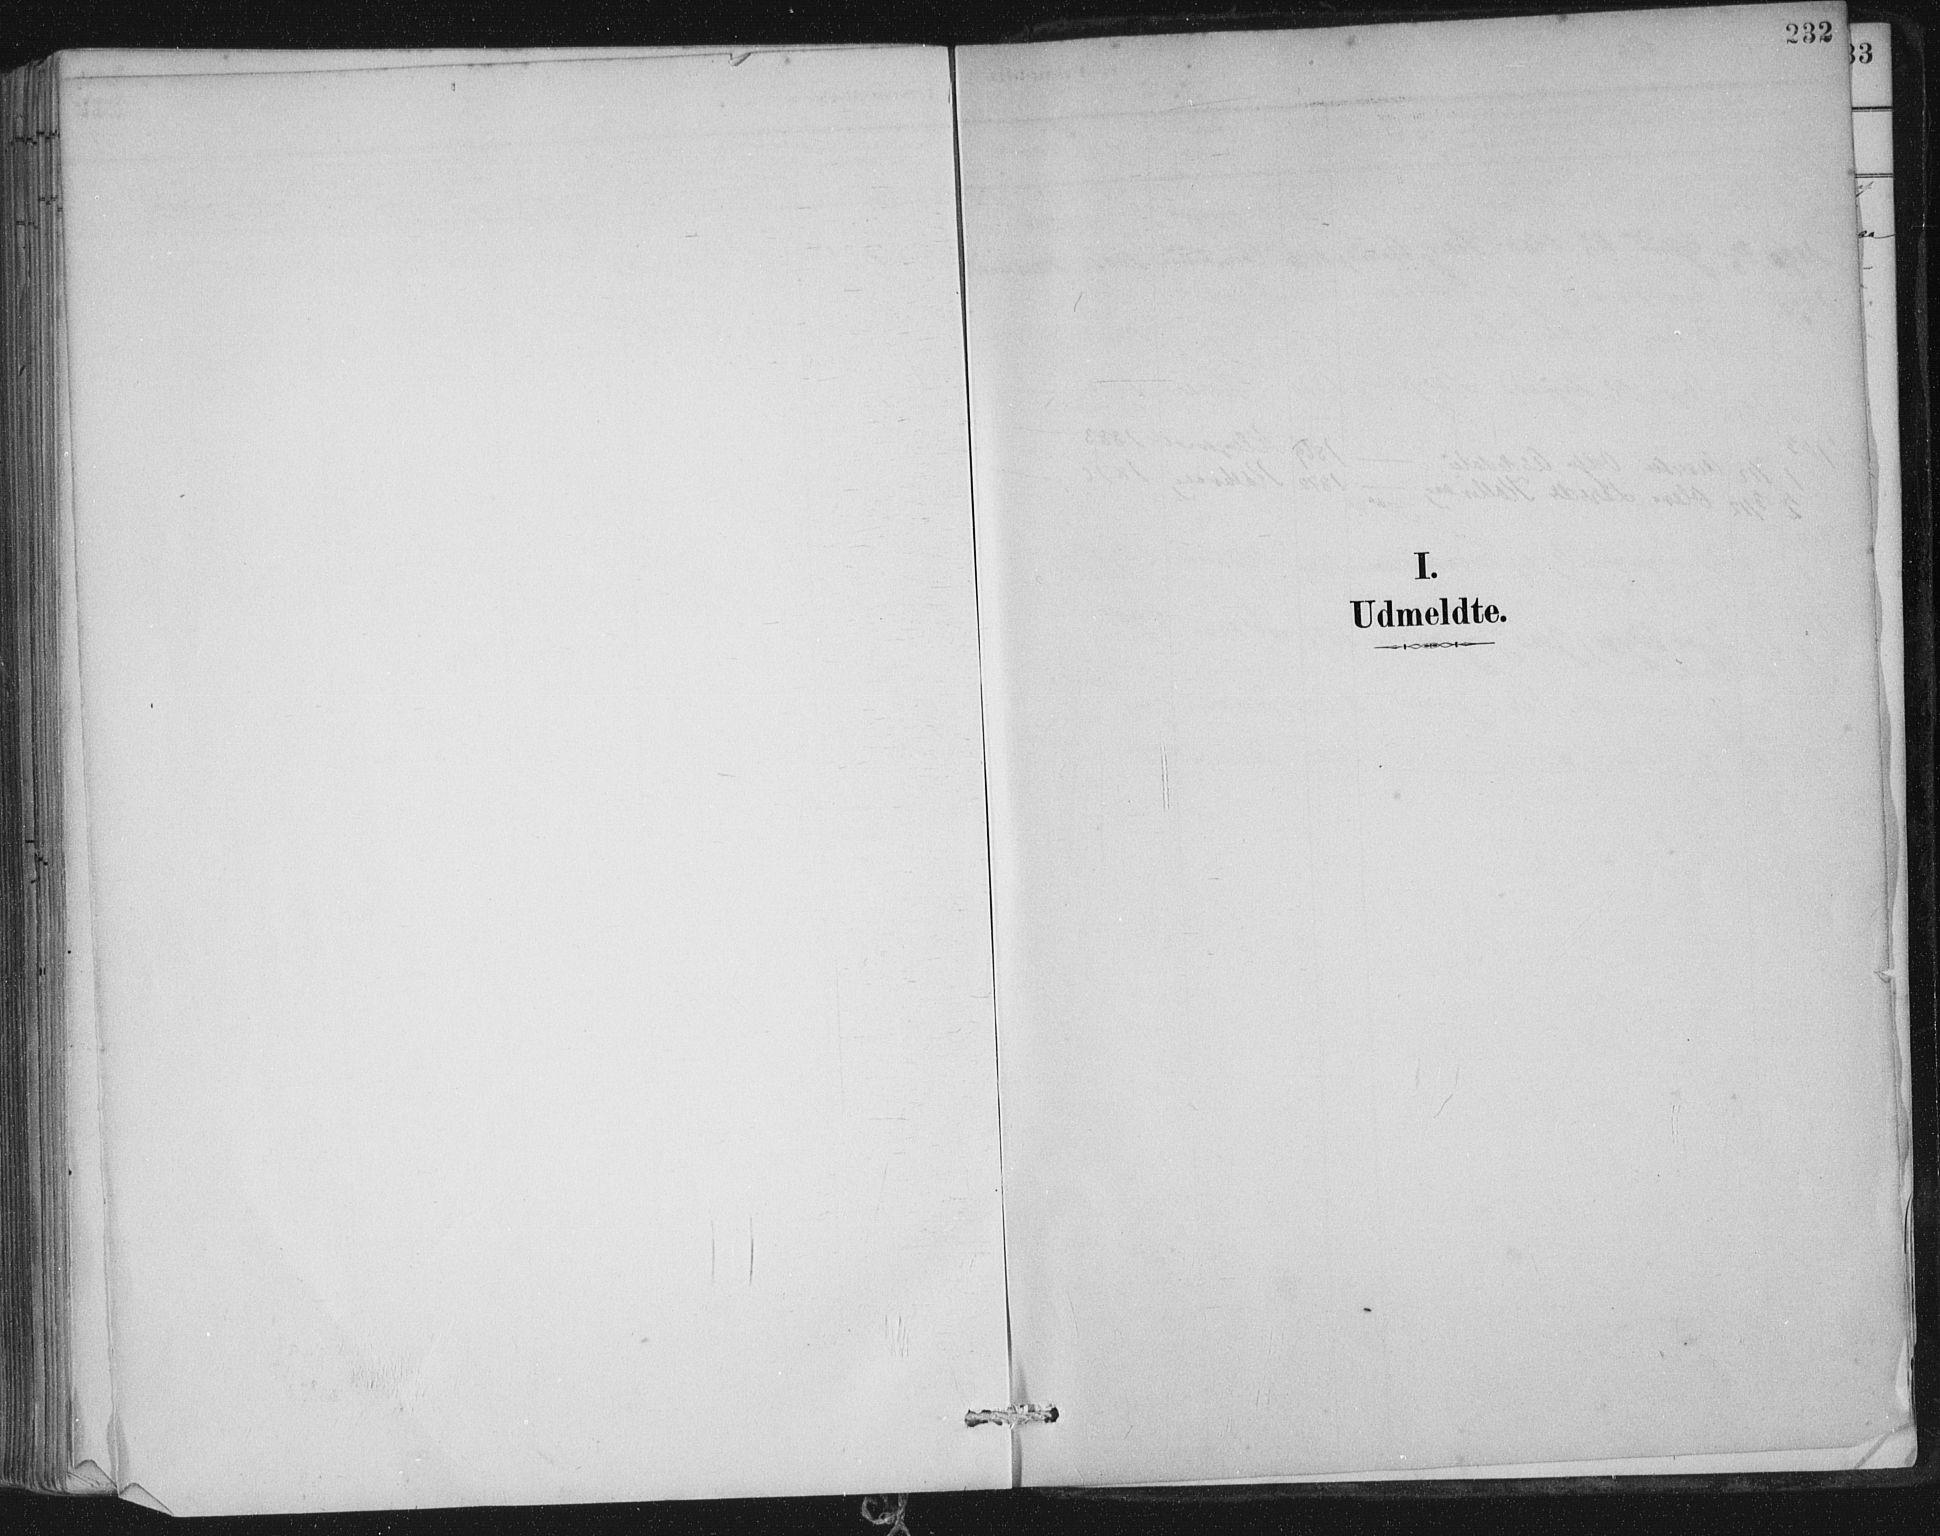 SAST, Nedstrand sokneprestkontor, IV: Ministerialbok nr. A 12, 1887-1915, s. 232